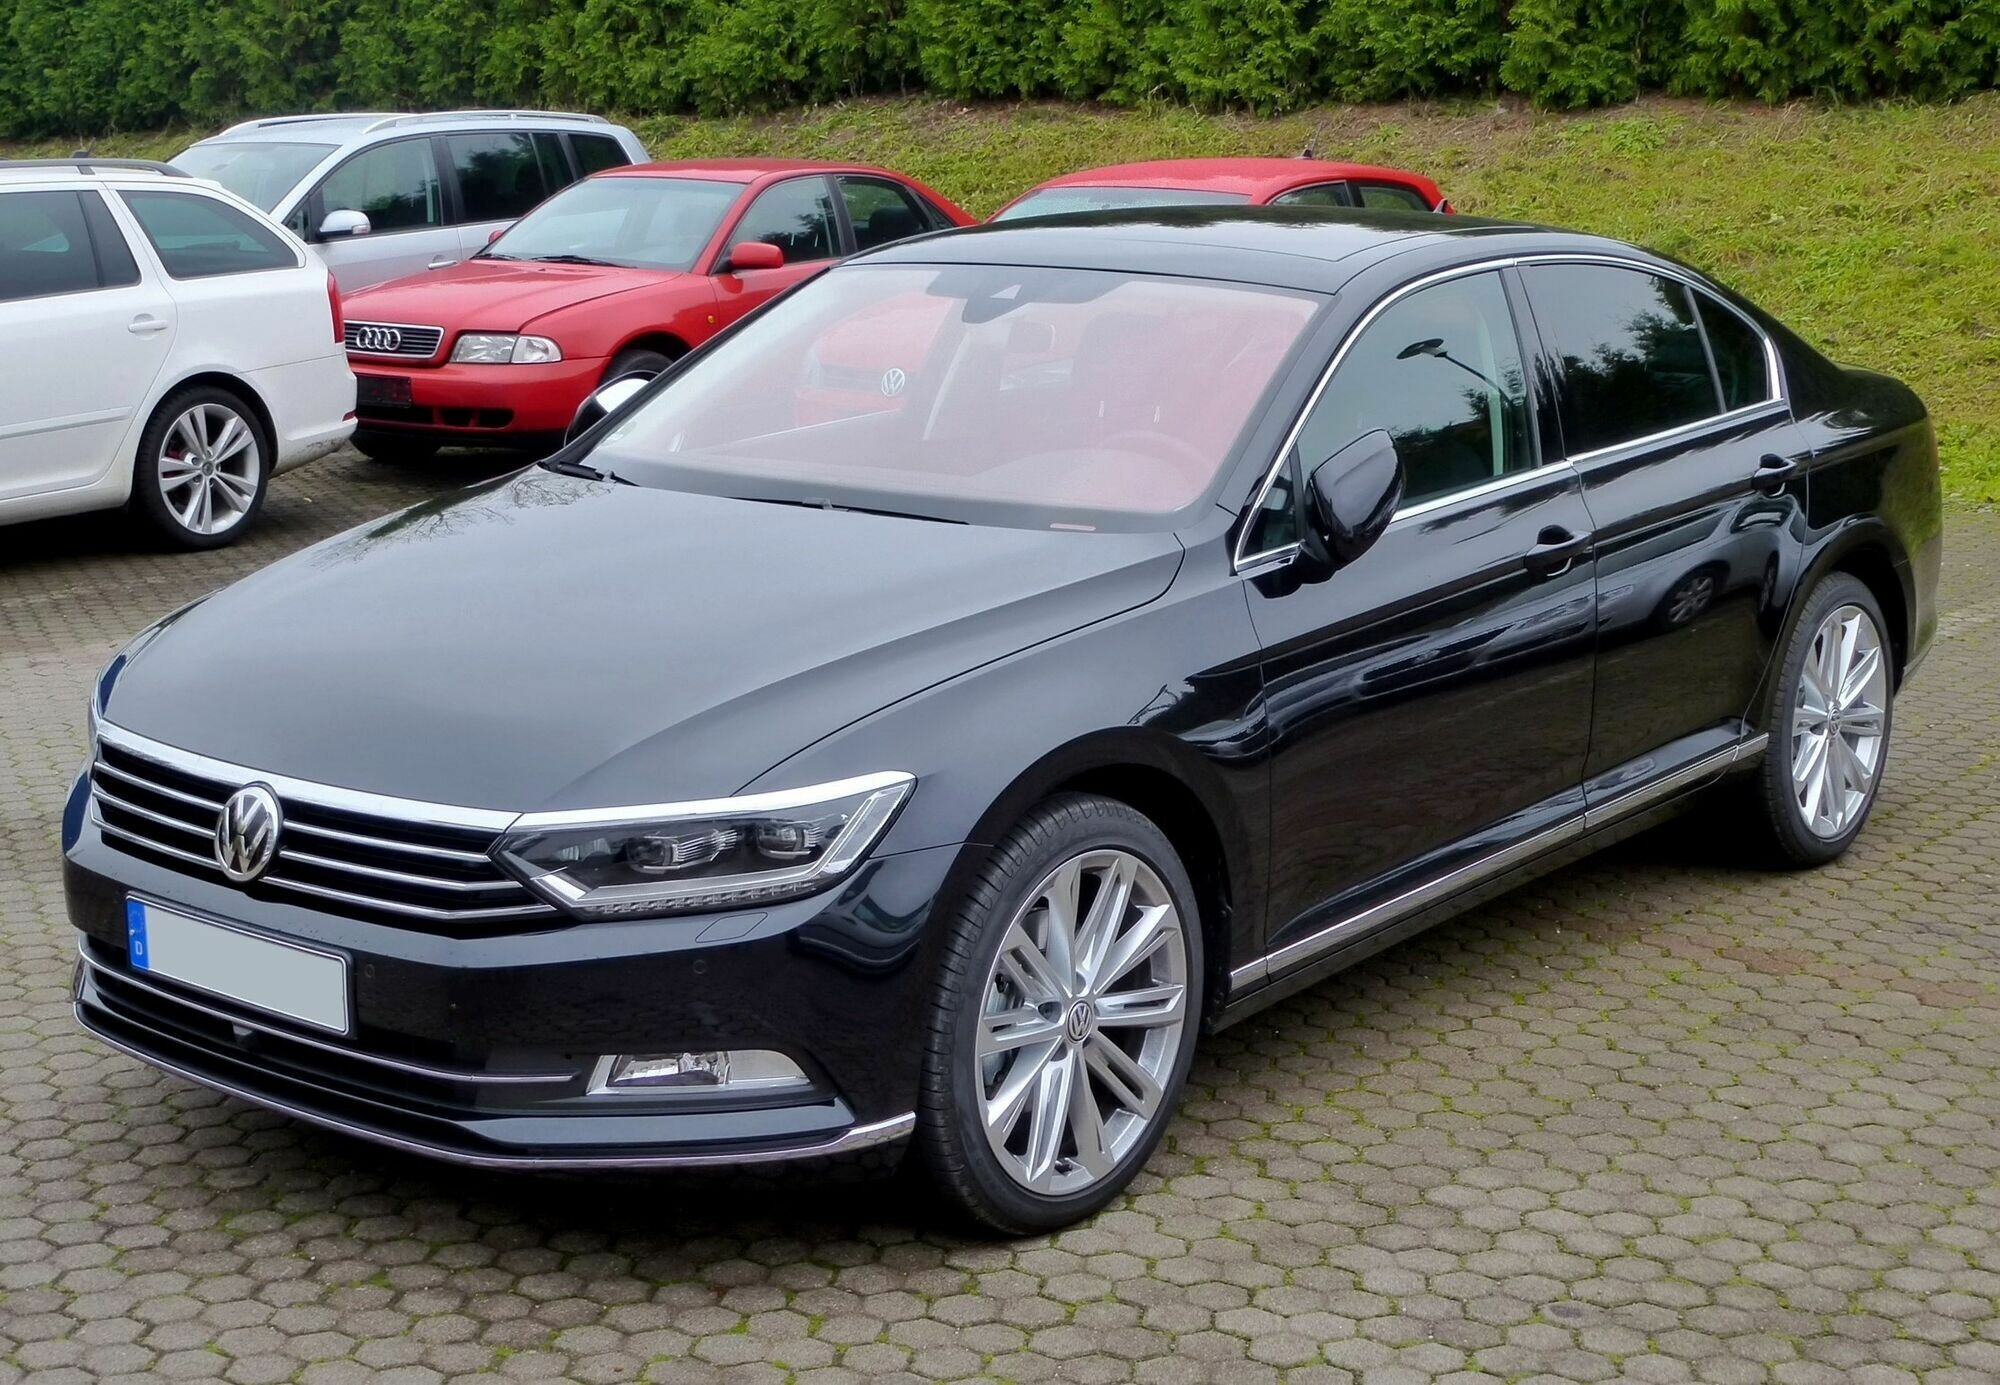 В Украине продают более 1300 Volkswagen Passat из США